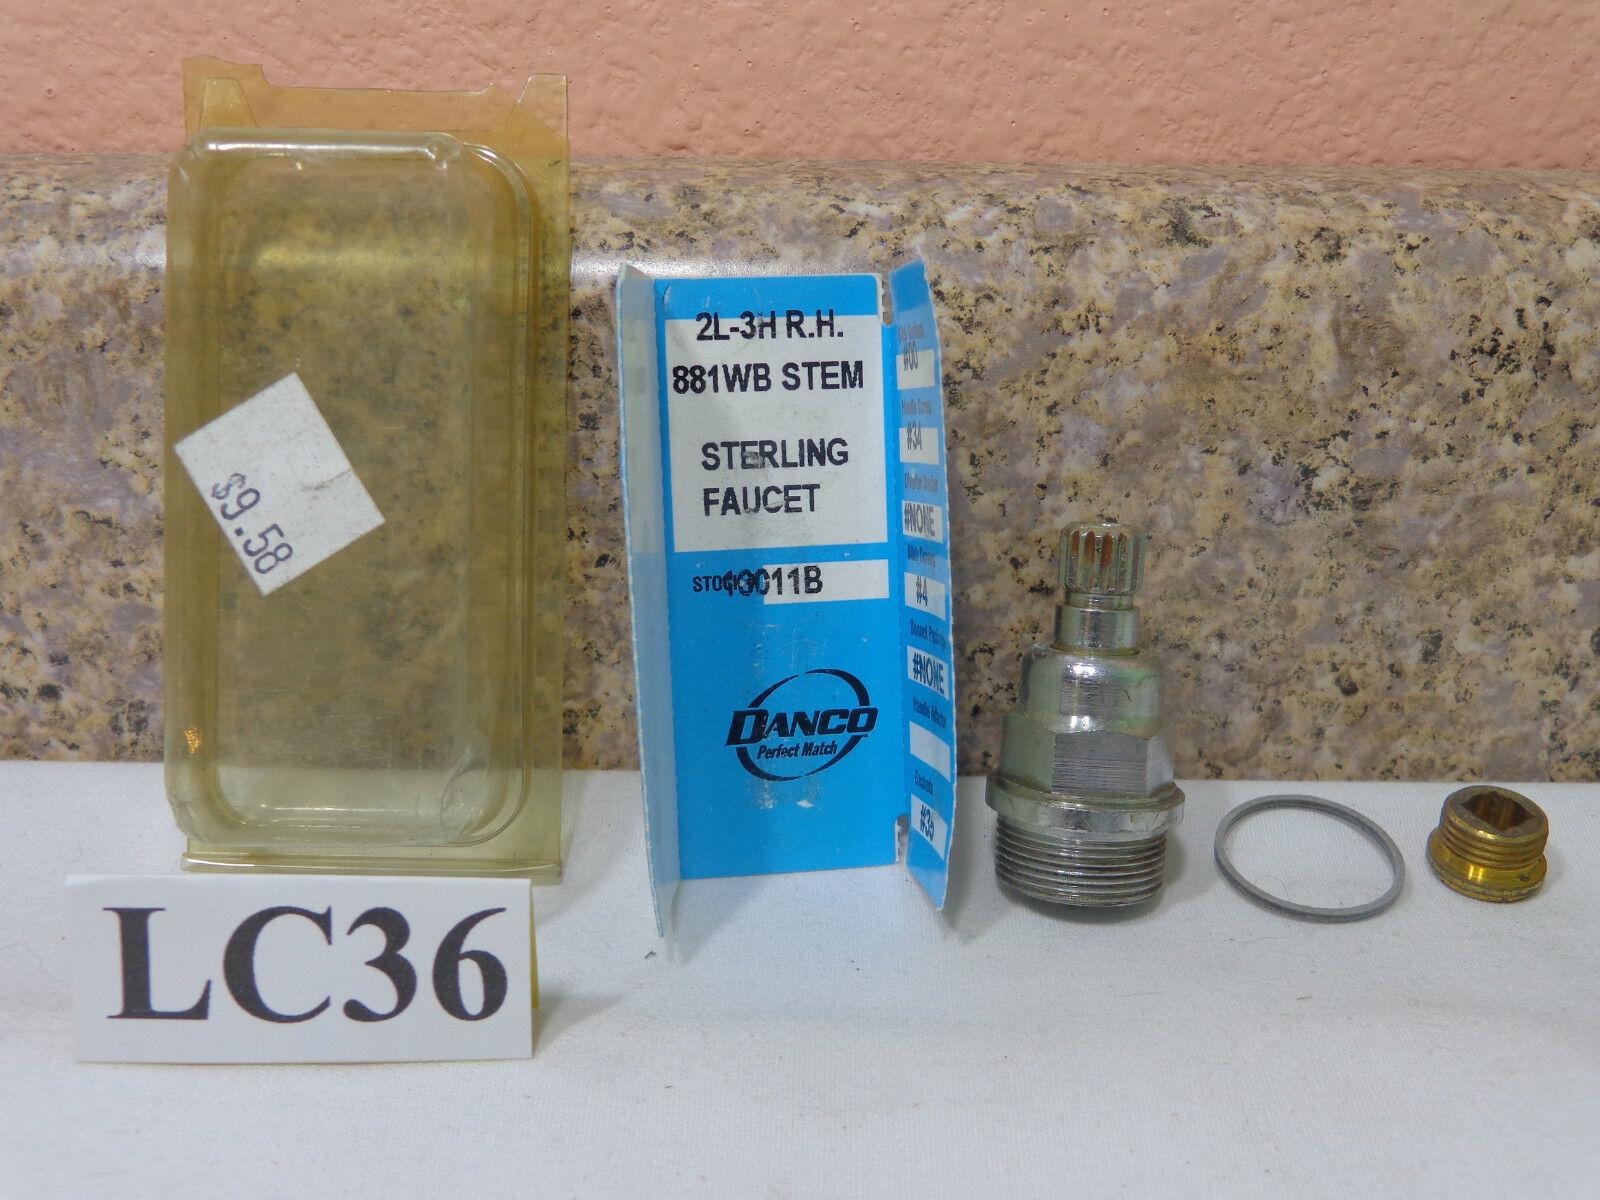 Danco 2l-3h Hot Stem 16011b Sterling Faucet | eBay